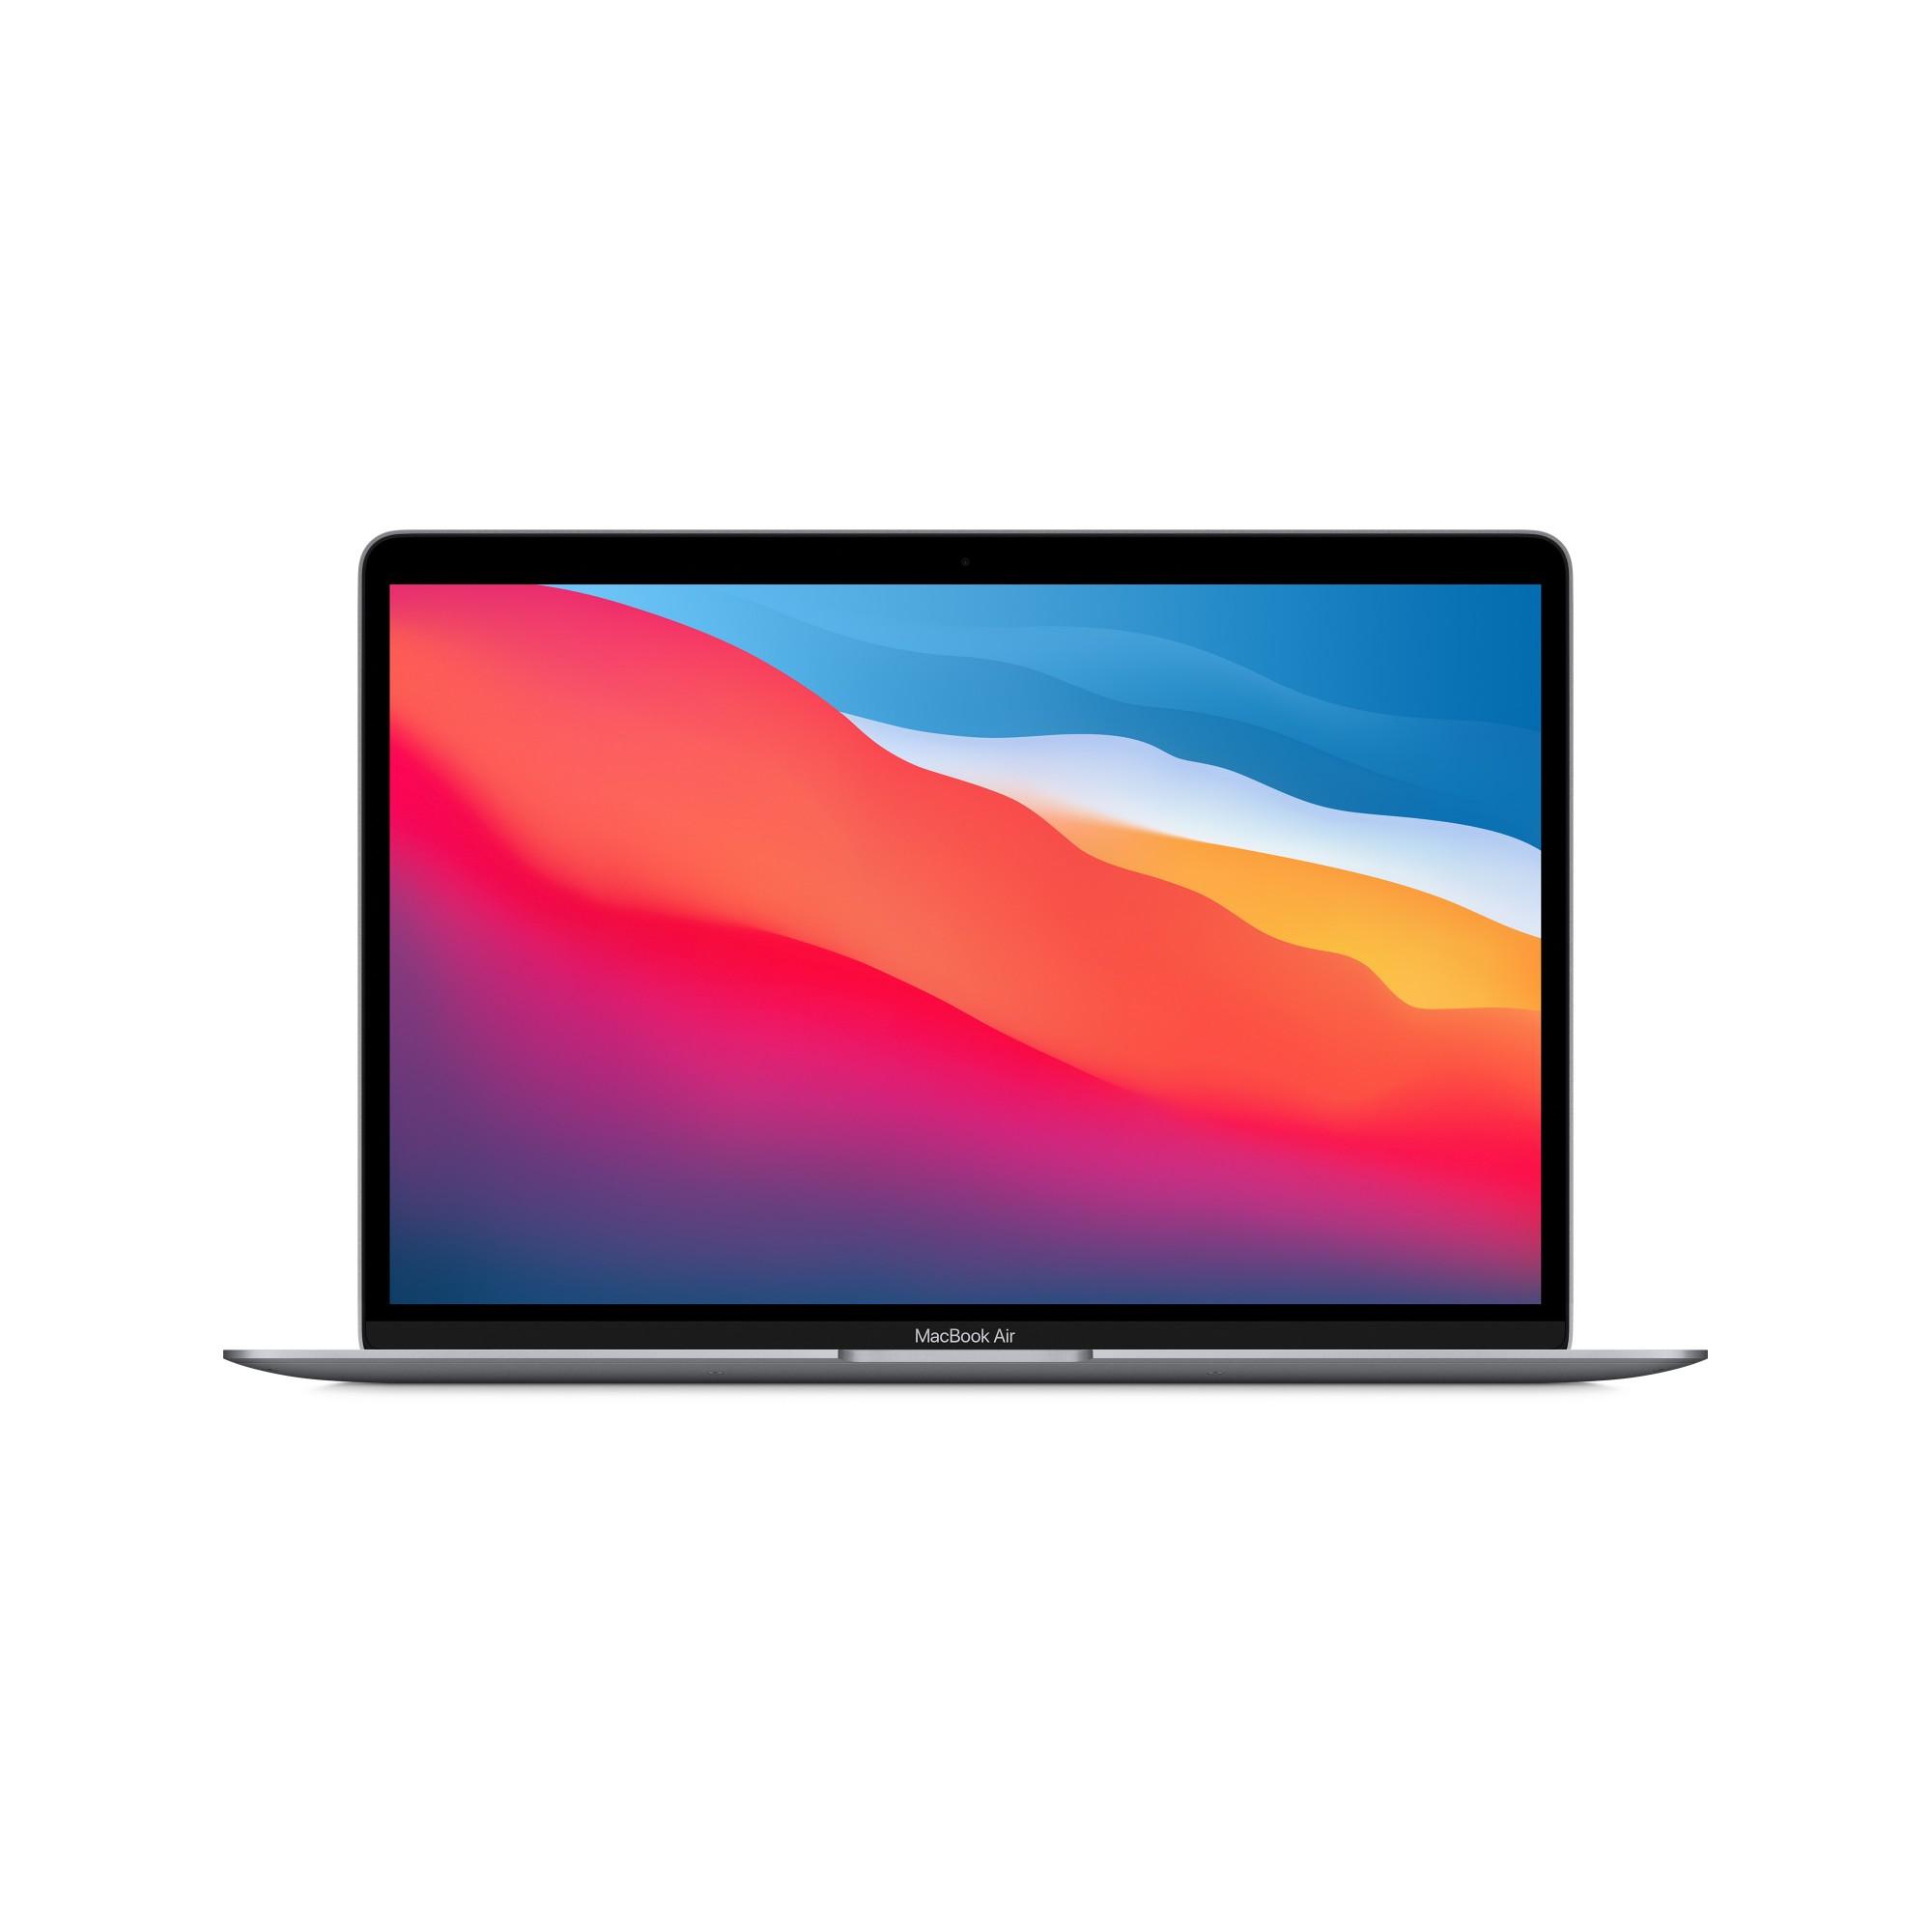 "Apple MacBook Air Portátil Gris 33,8 cm (13.3"") 2560 x 1600 Pixeles Apple M 8 GB 256 GB SSD Wi-Fi 6 (802.11ax) macOS Big Sur"